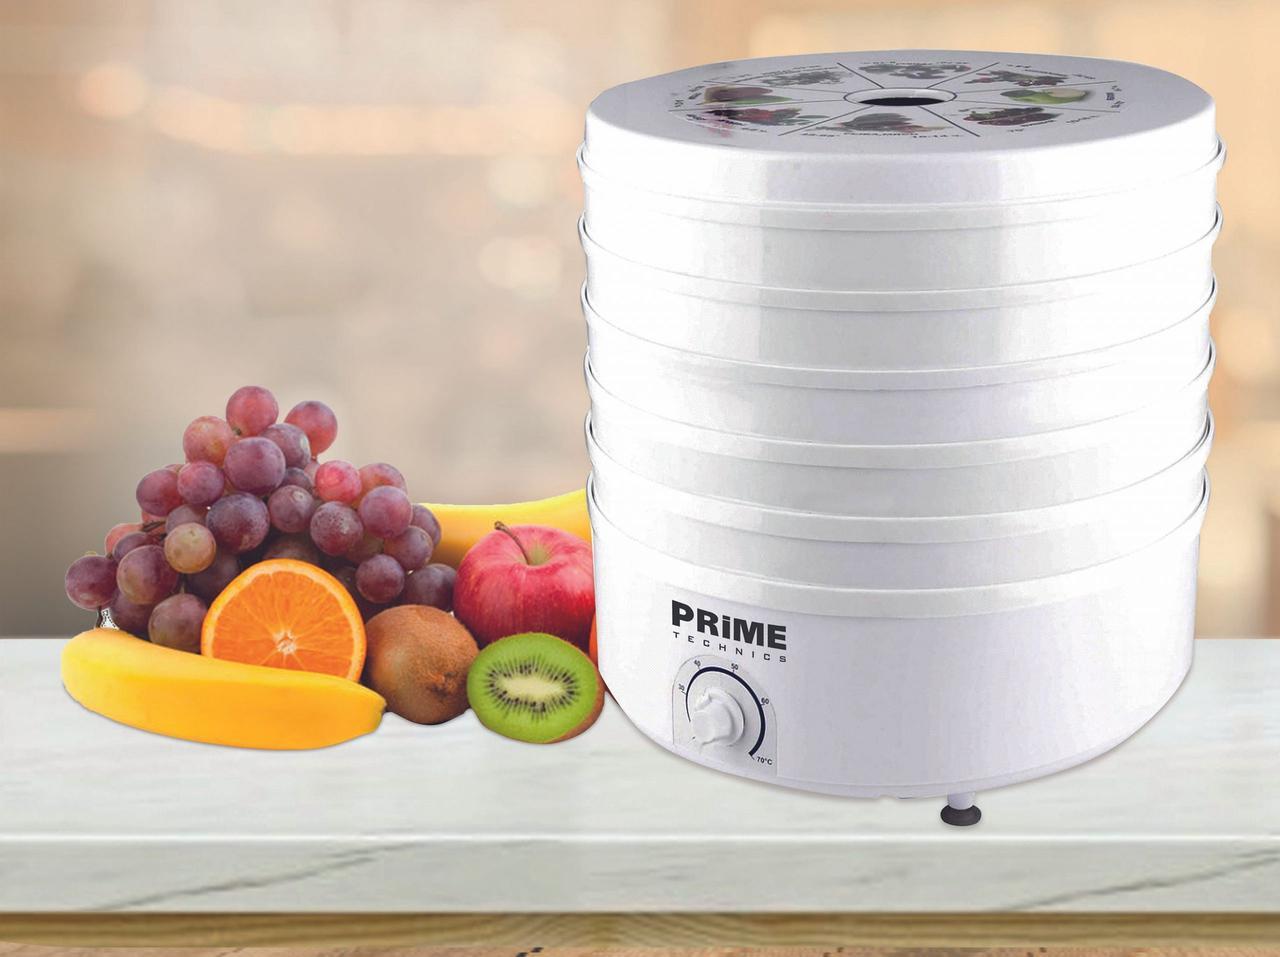 Сушилка для овощей и фруктов  PRIME Technics PFD 502 W